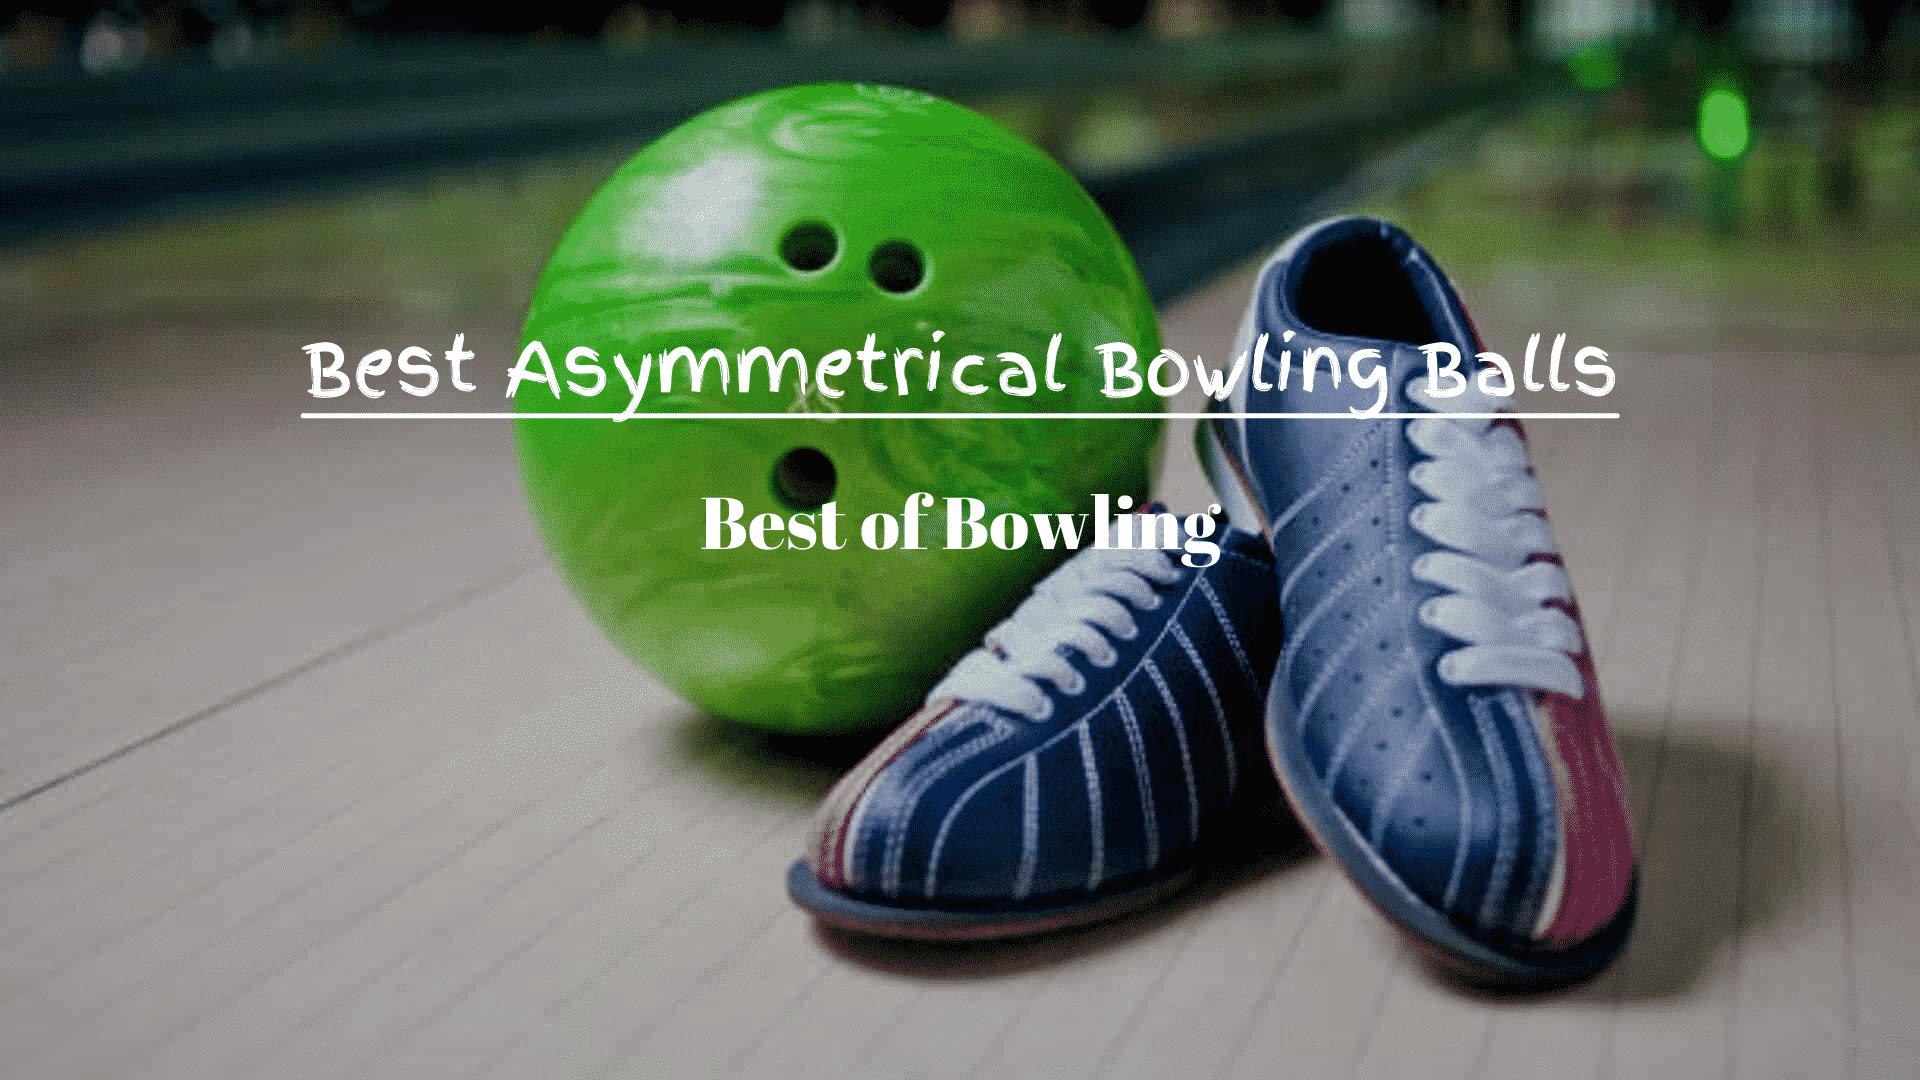 Best Asymmetrical Bowling Balls